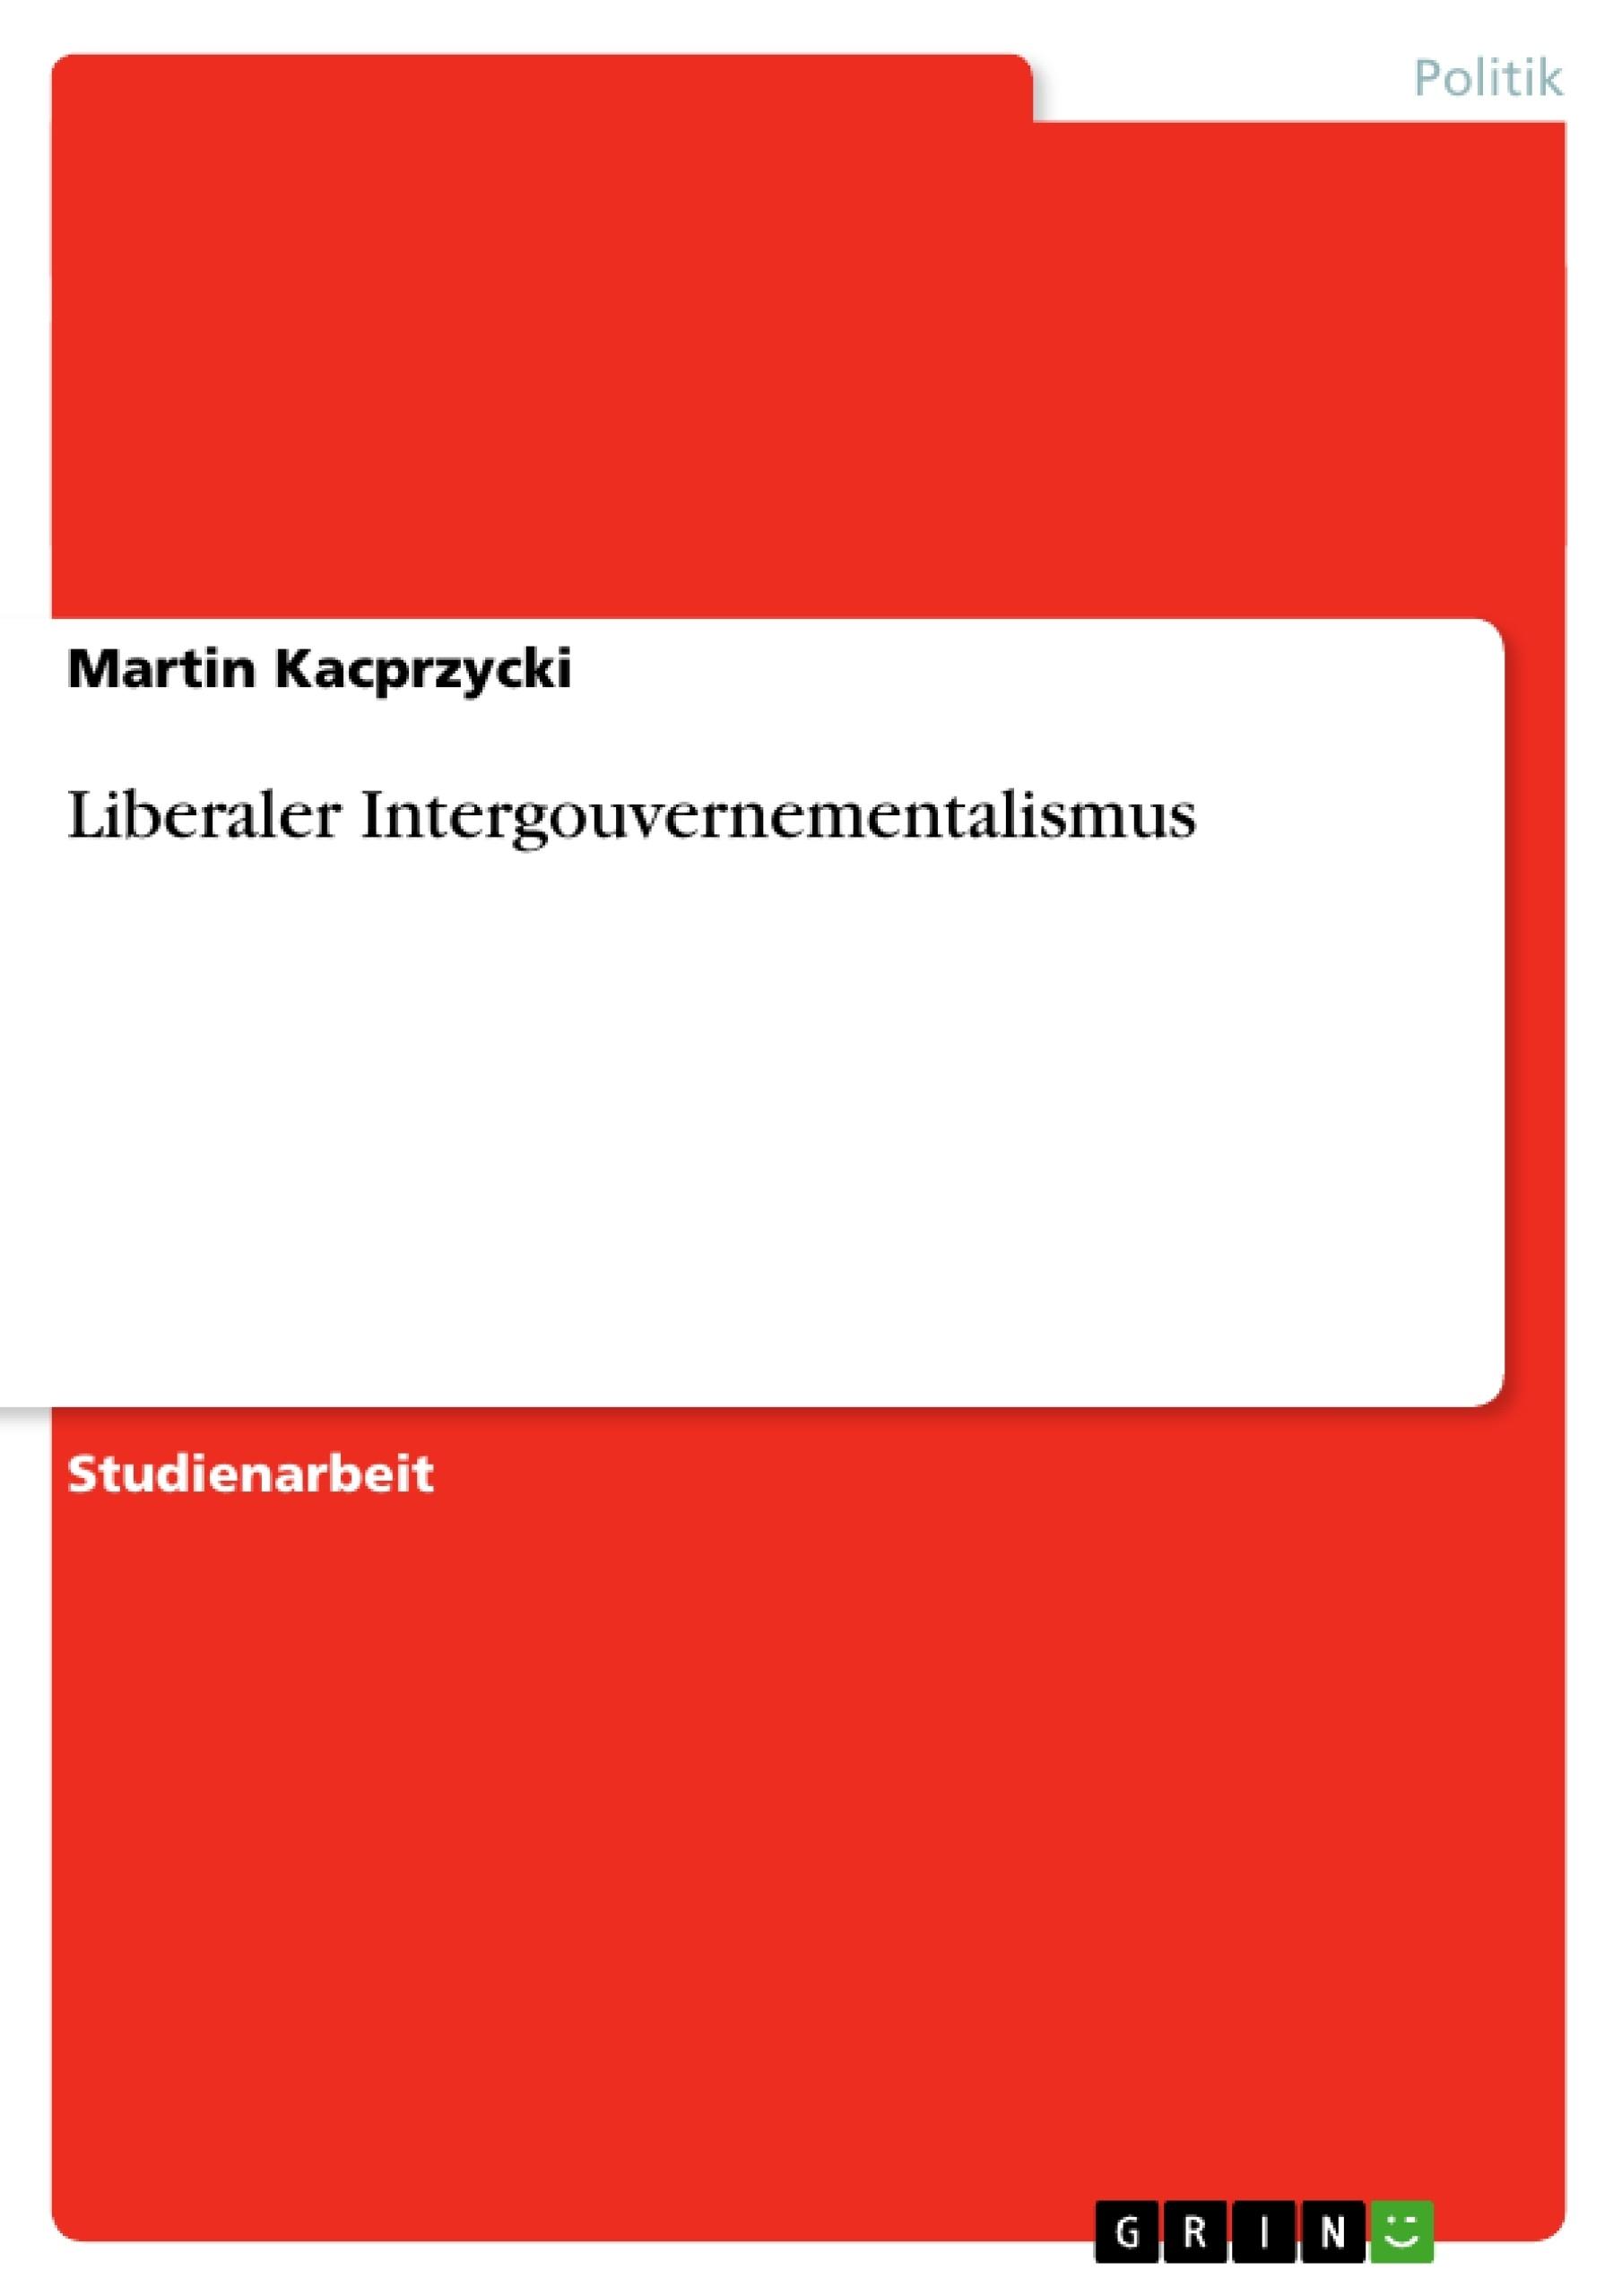 Titel: Liberaler Intergouvernementalismus